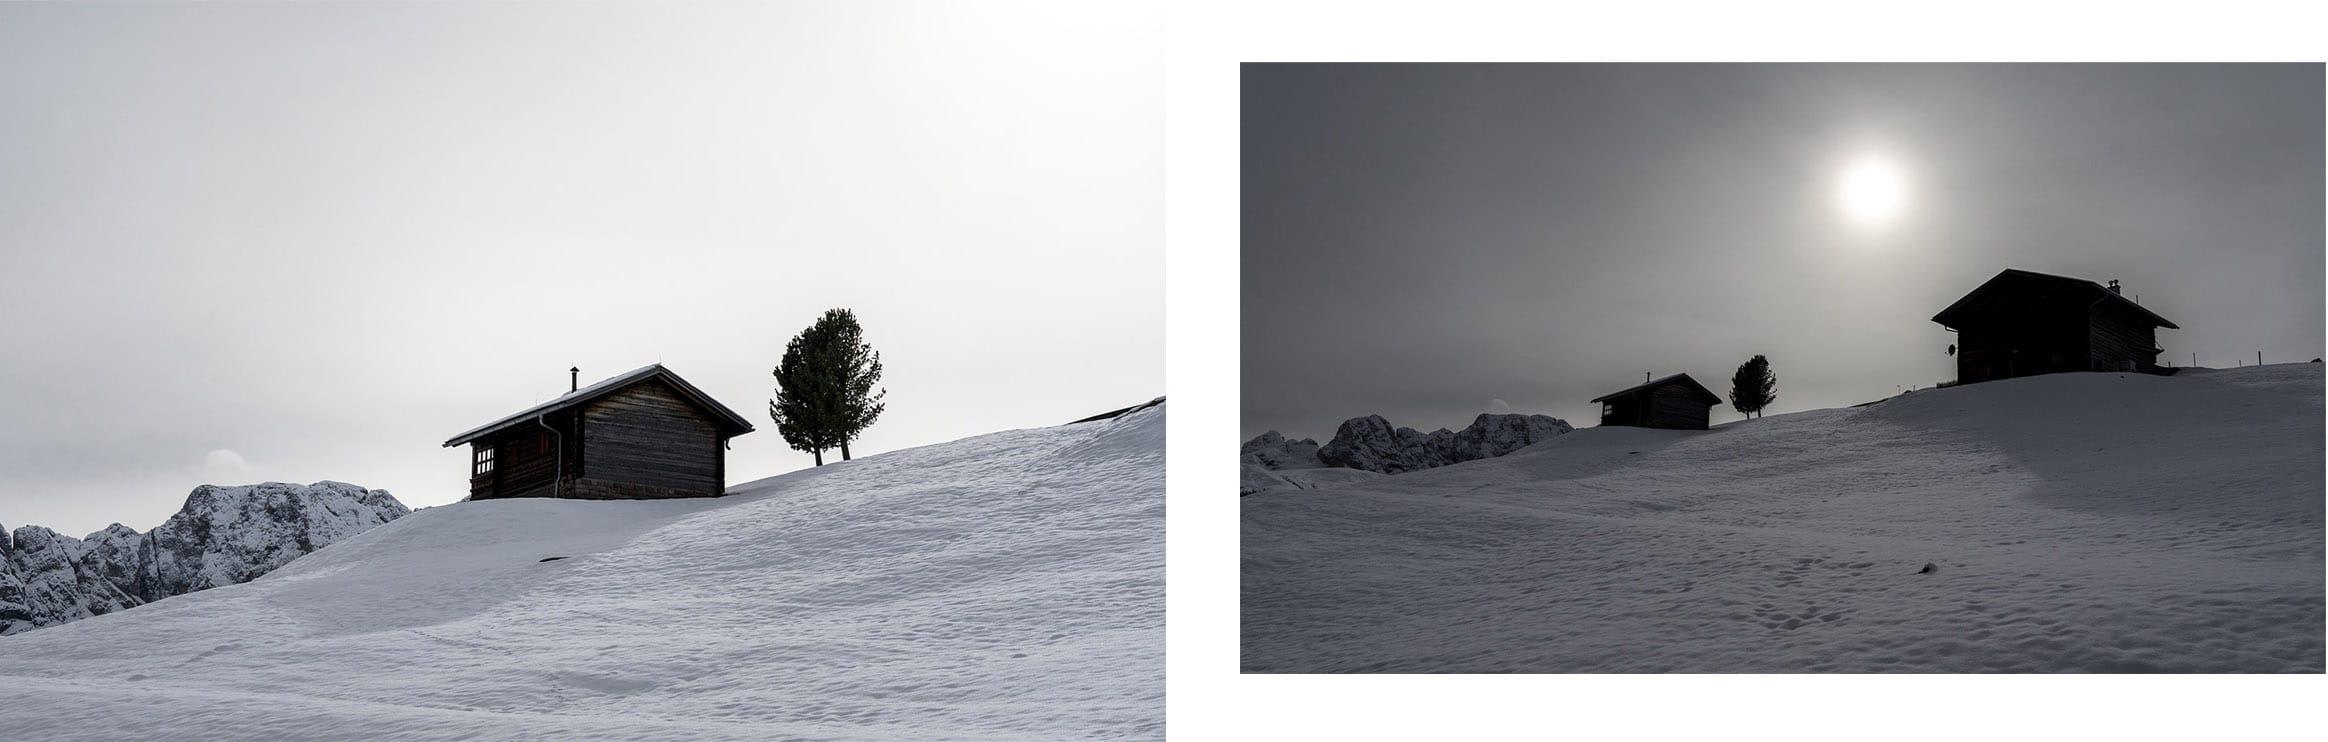 Cabane neige arbre